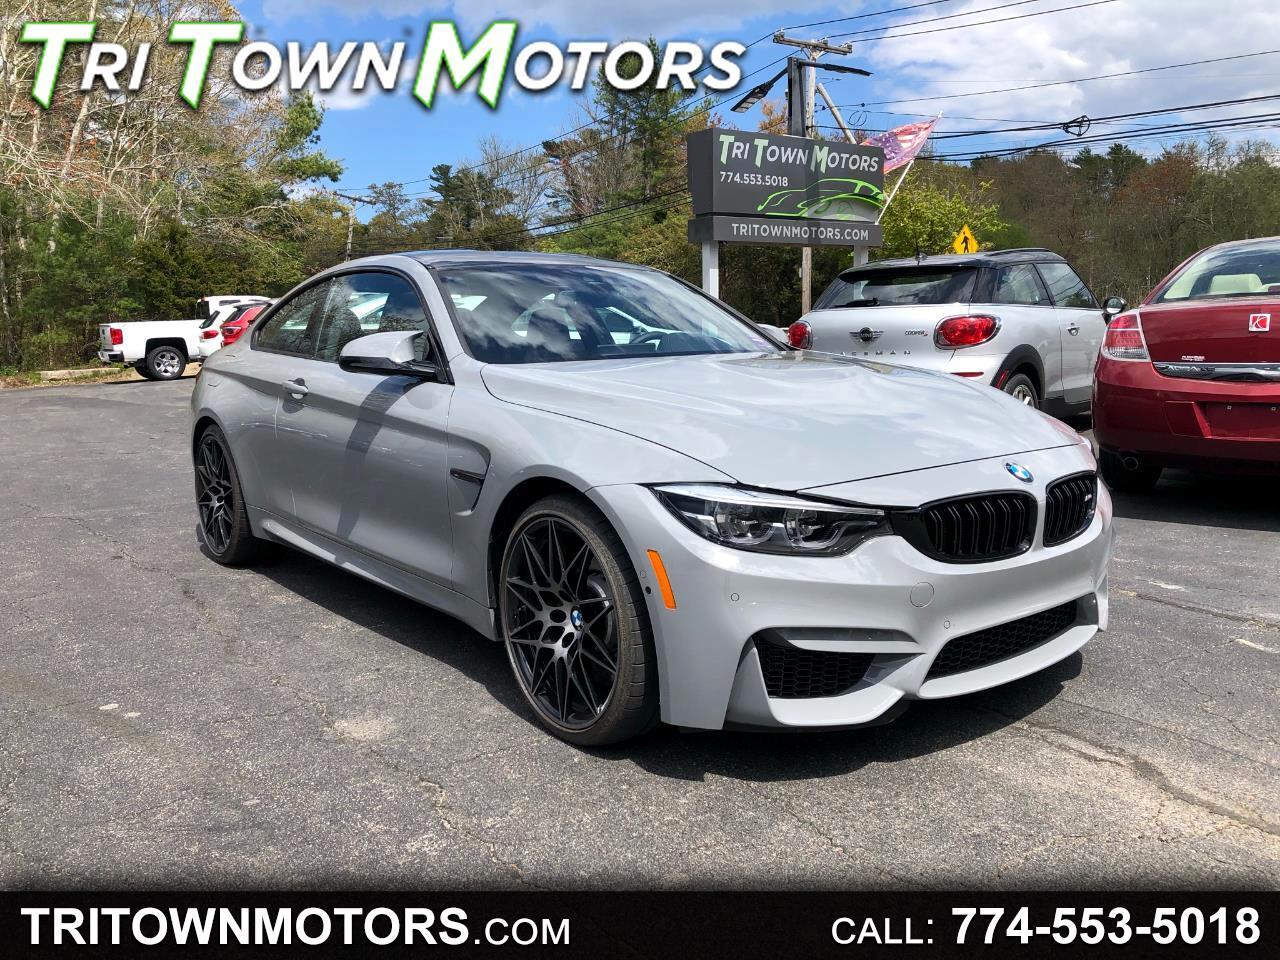 BMW M4 2dr Conv 2020